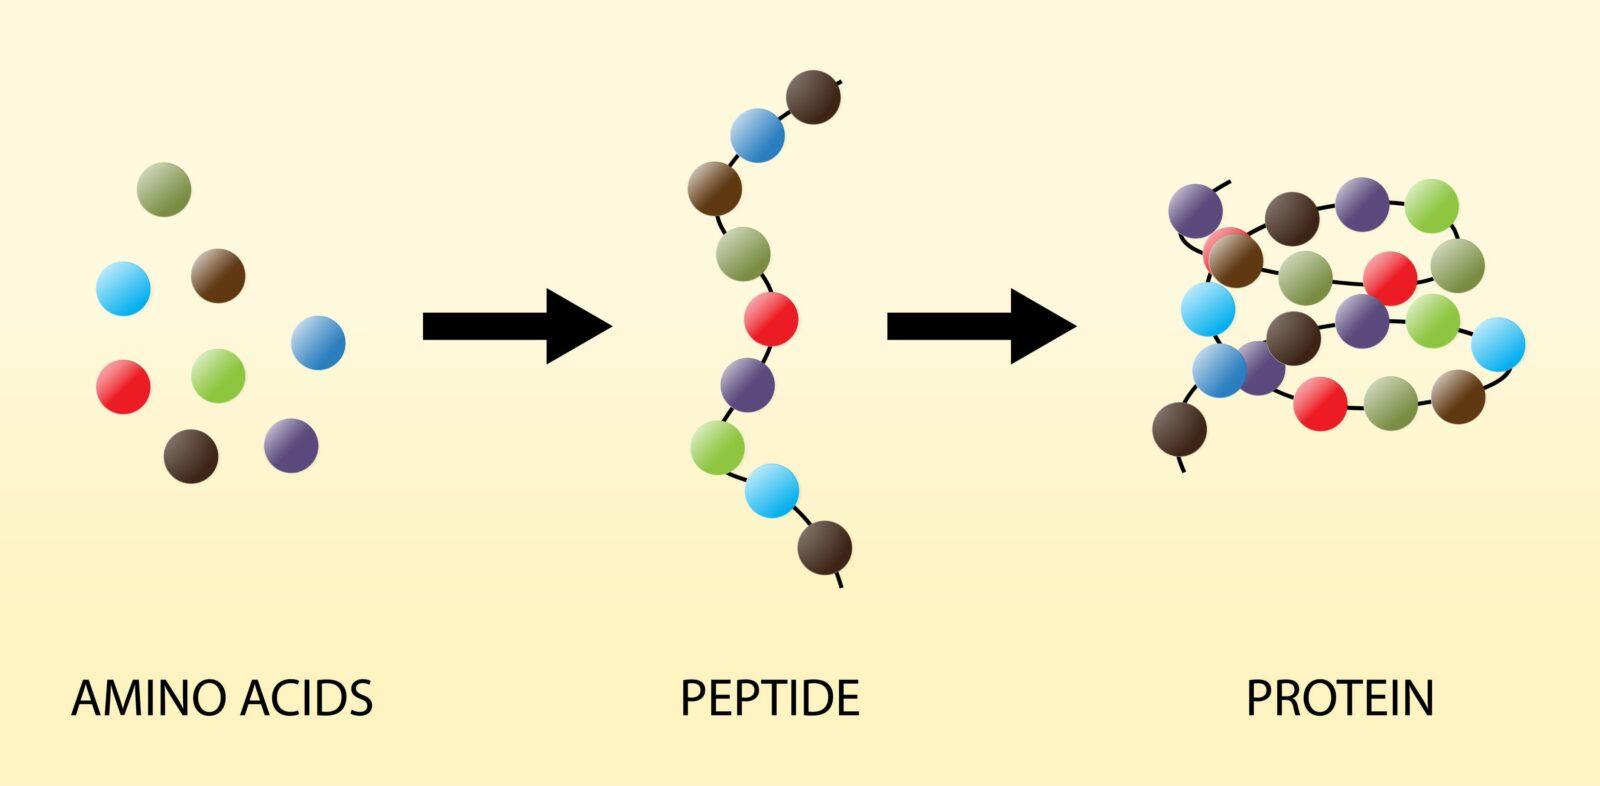 peptide, amino acids, proteins